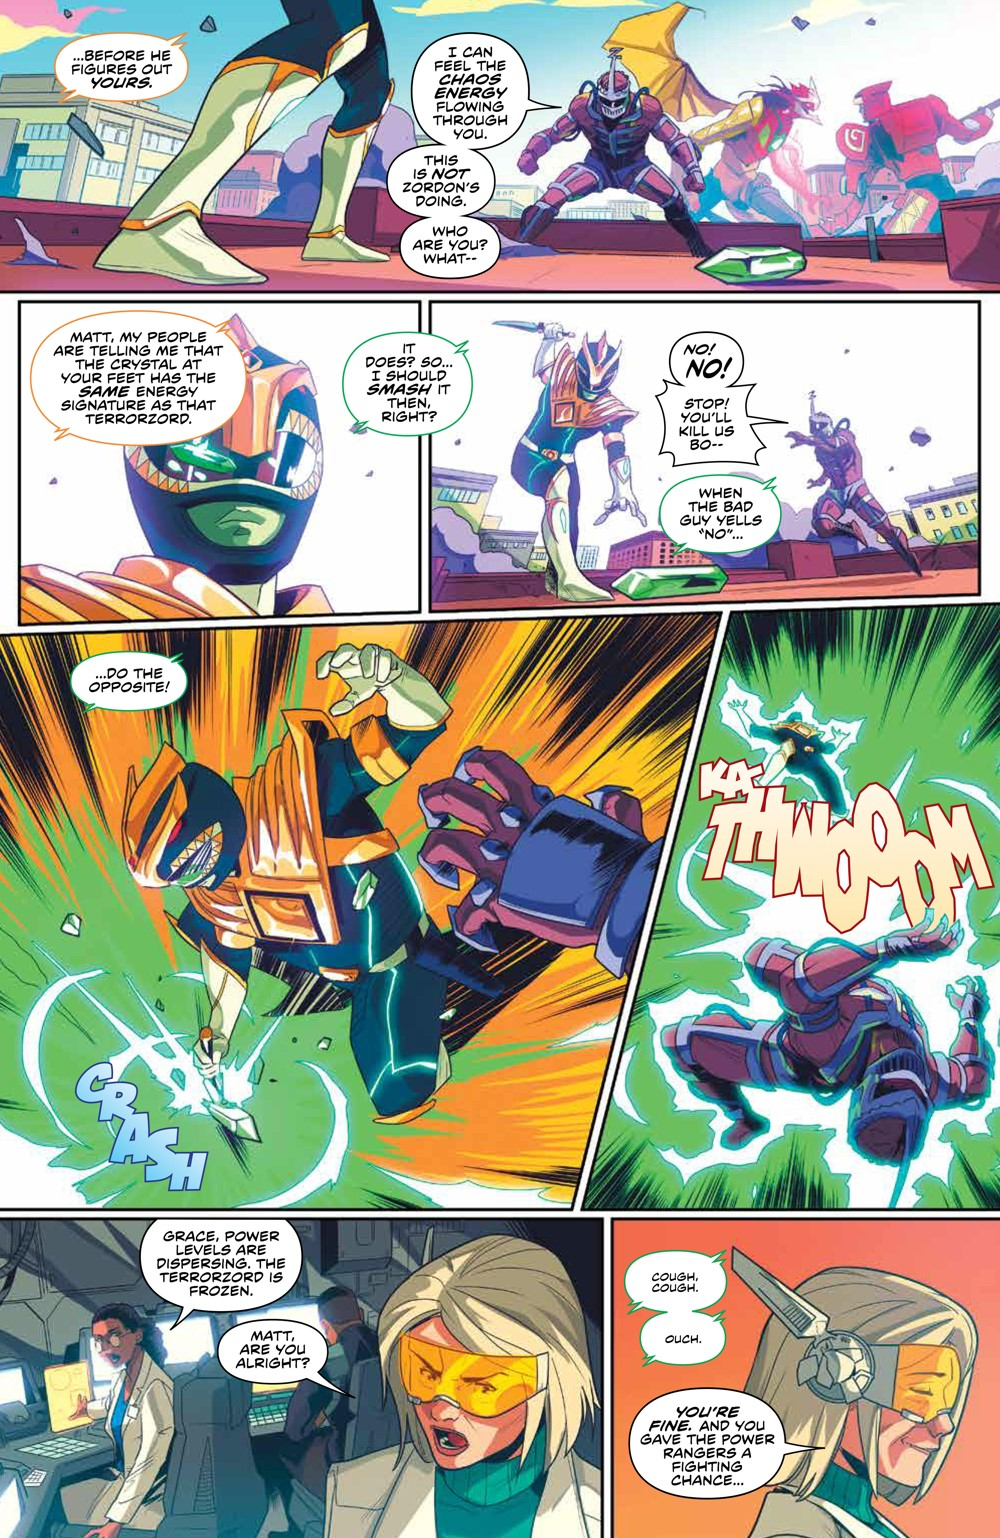 MightyMorphin_v2_SC_PRESS_12 ComicList Previews: MIGHTY MORPHIN VOLUME 2 TP